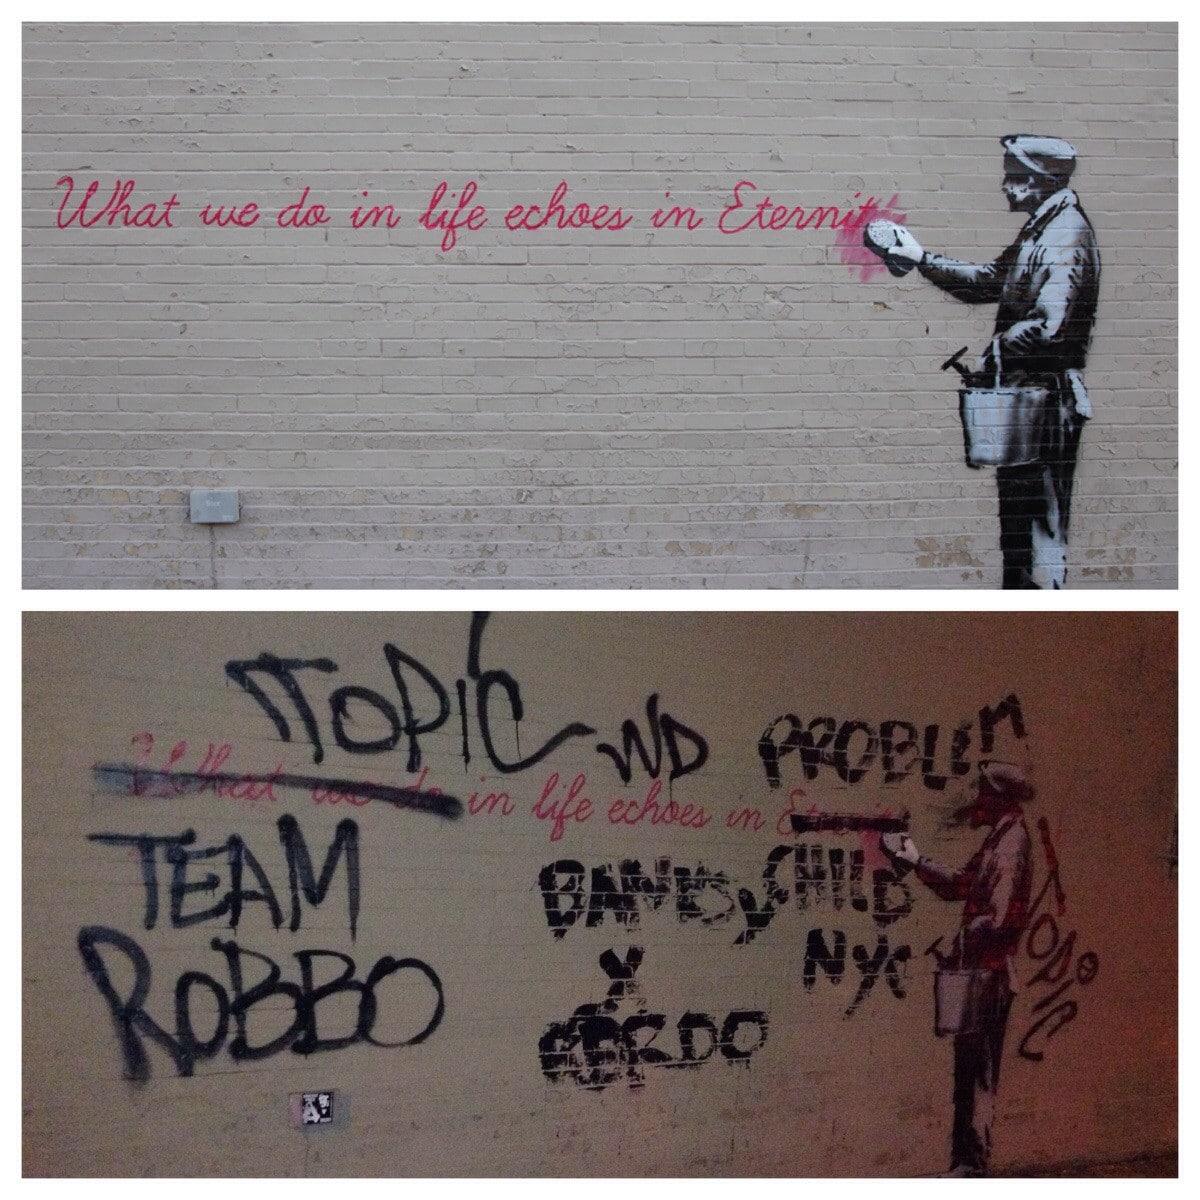 Banksy x Robbo